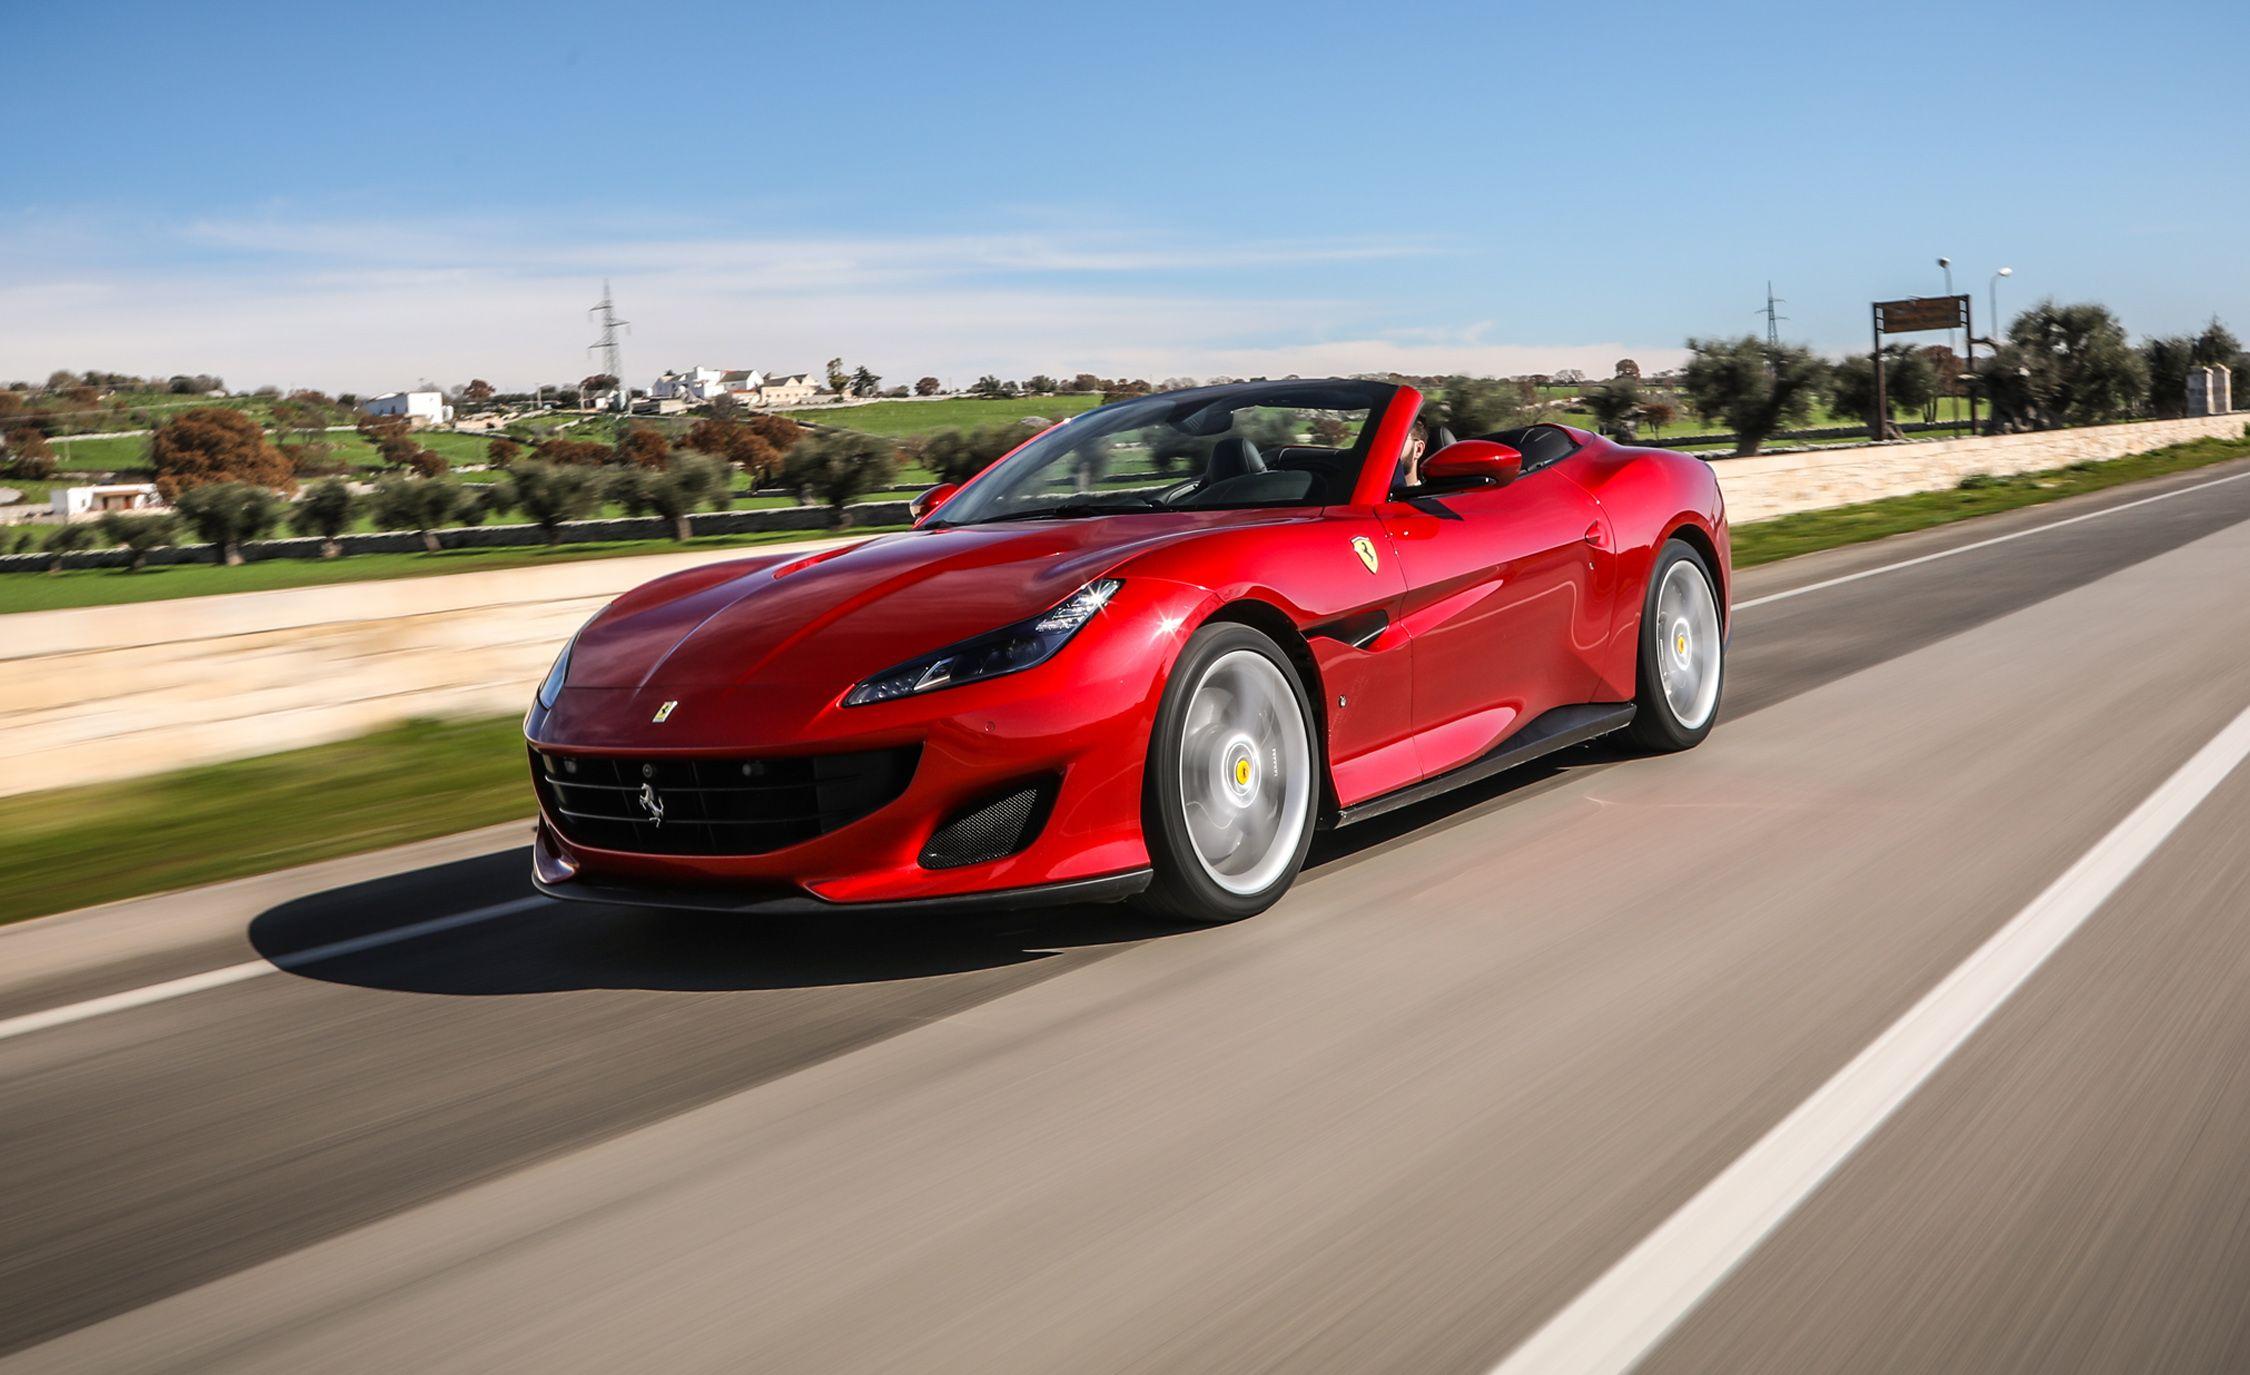 Smart Car Wallpaper 2018 Ferrari Portofino First Drive Review Car And Driver